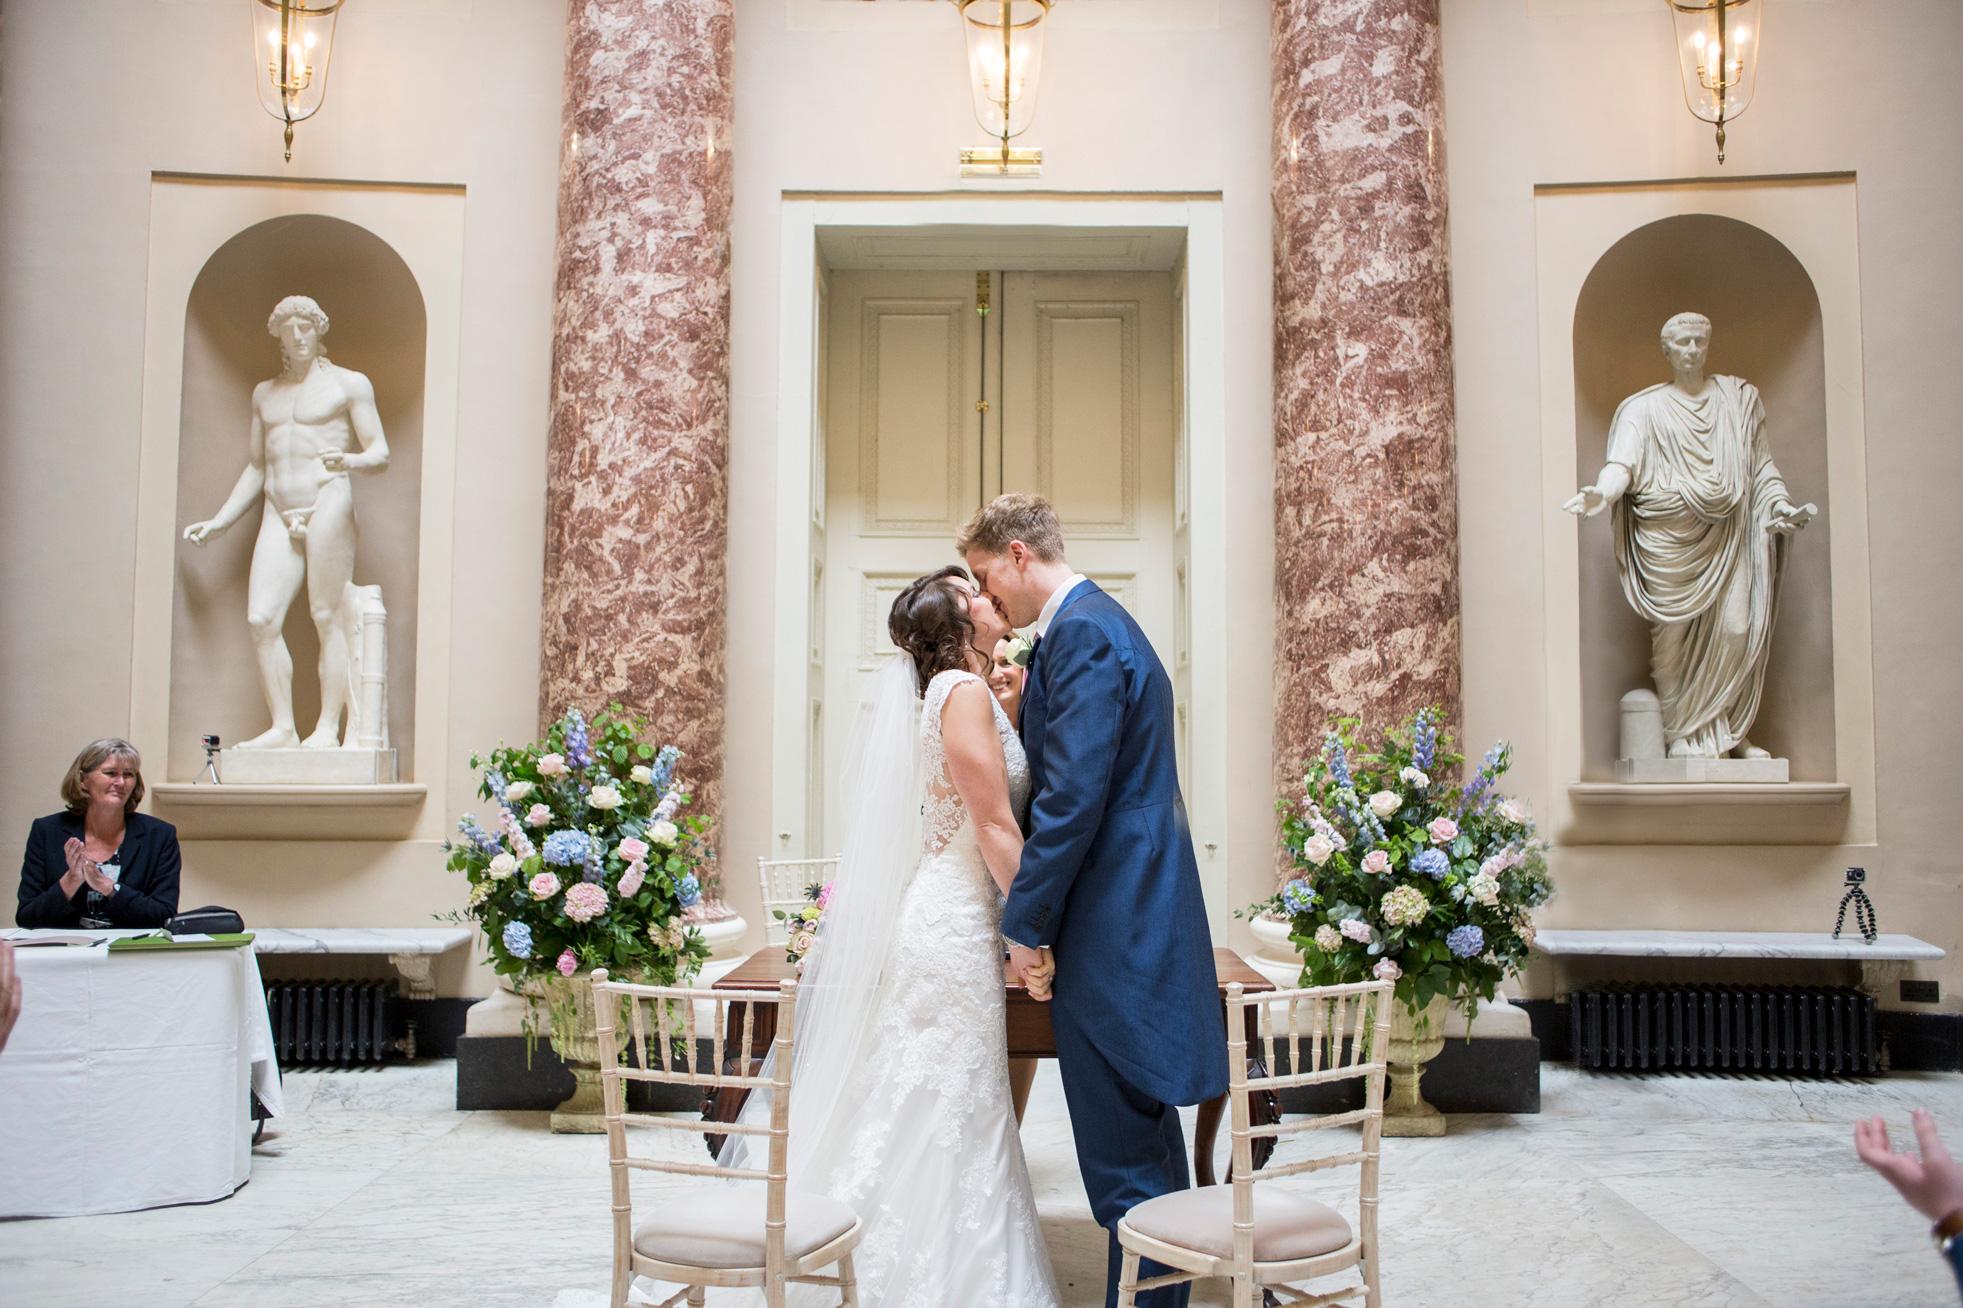 Ceremony, kiss, bride, groom,